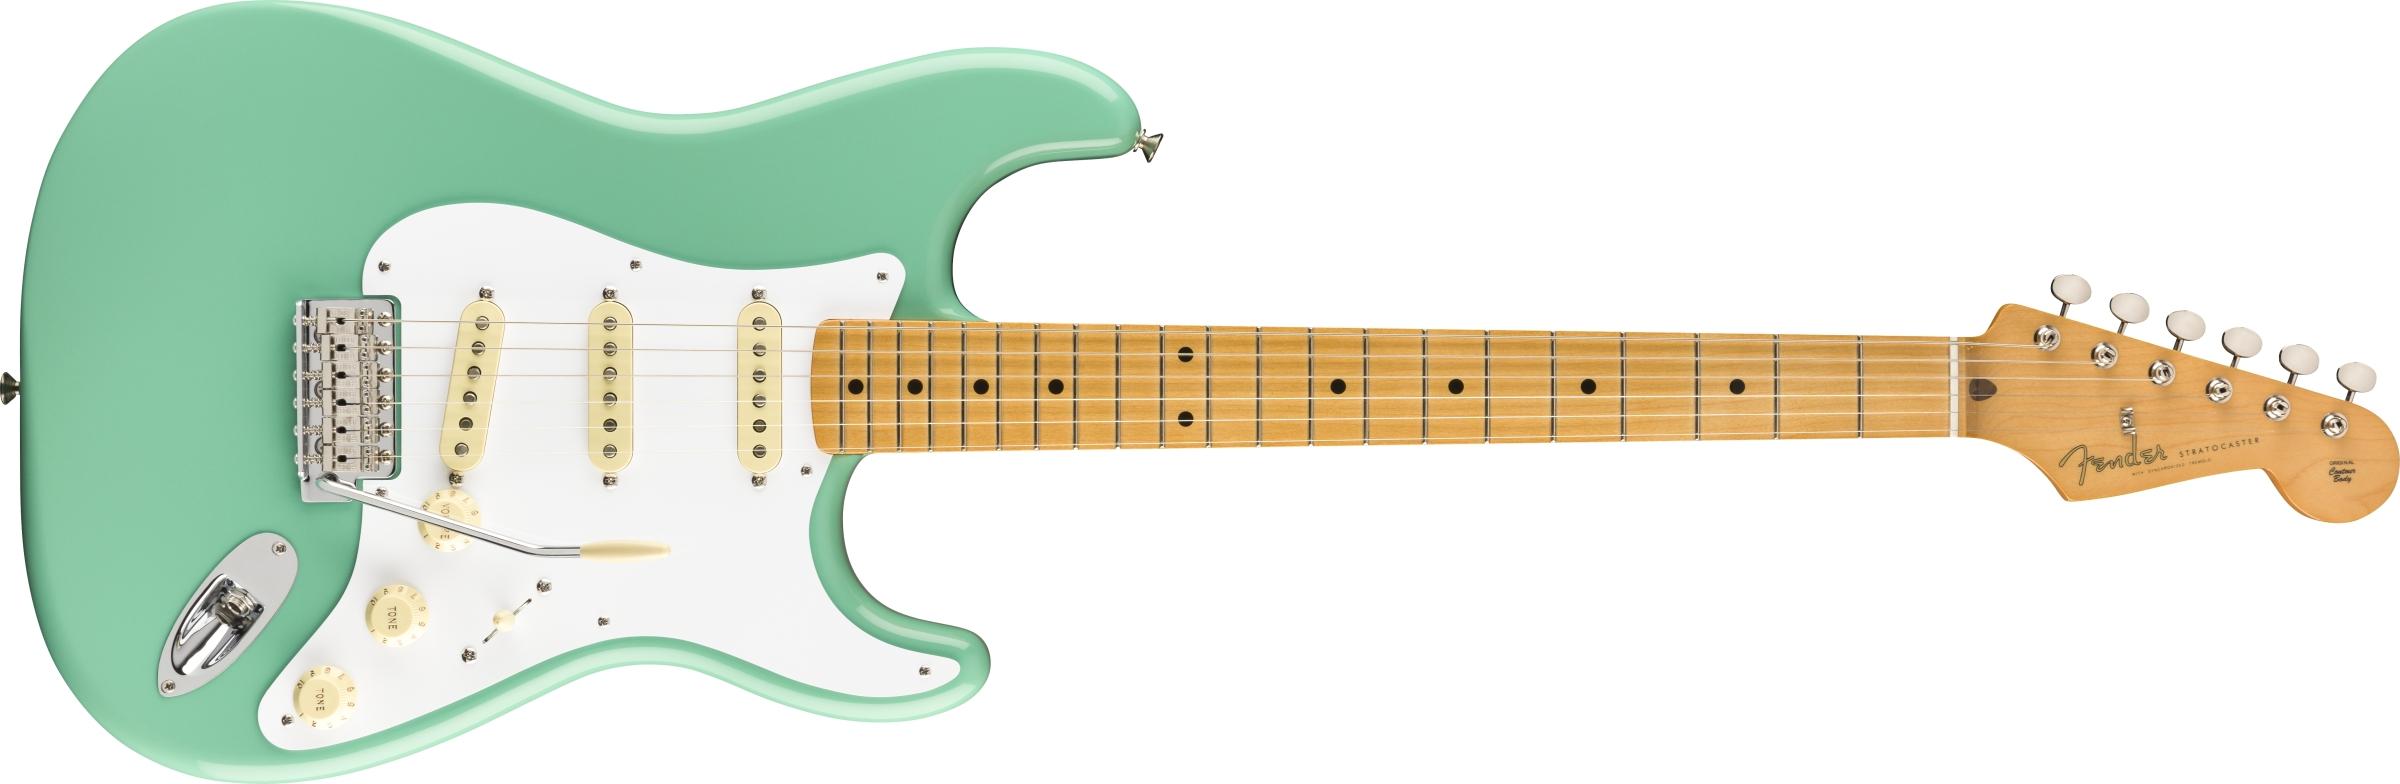 Fender 50/'s Style Stratocaster Strat Maple Fingerboard Soft V Shape Guitar Neck